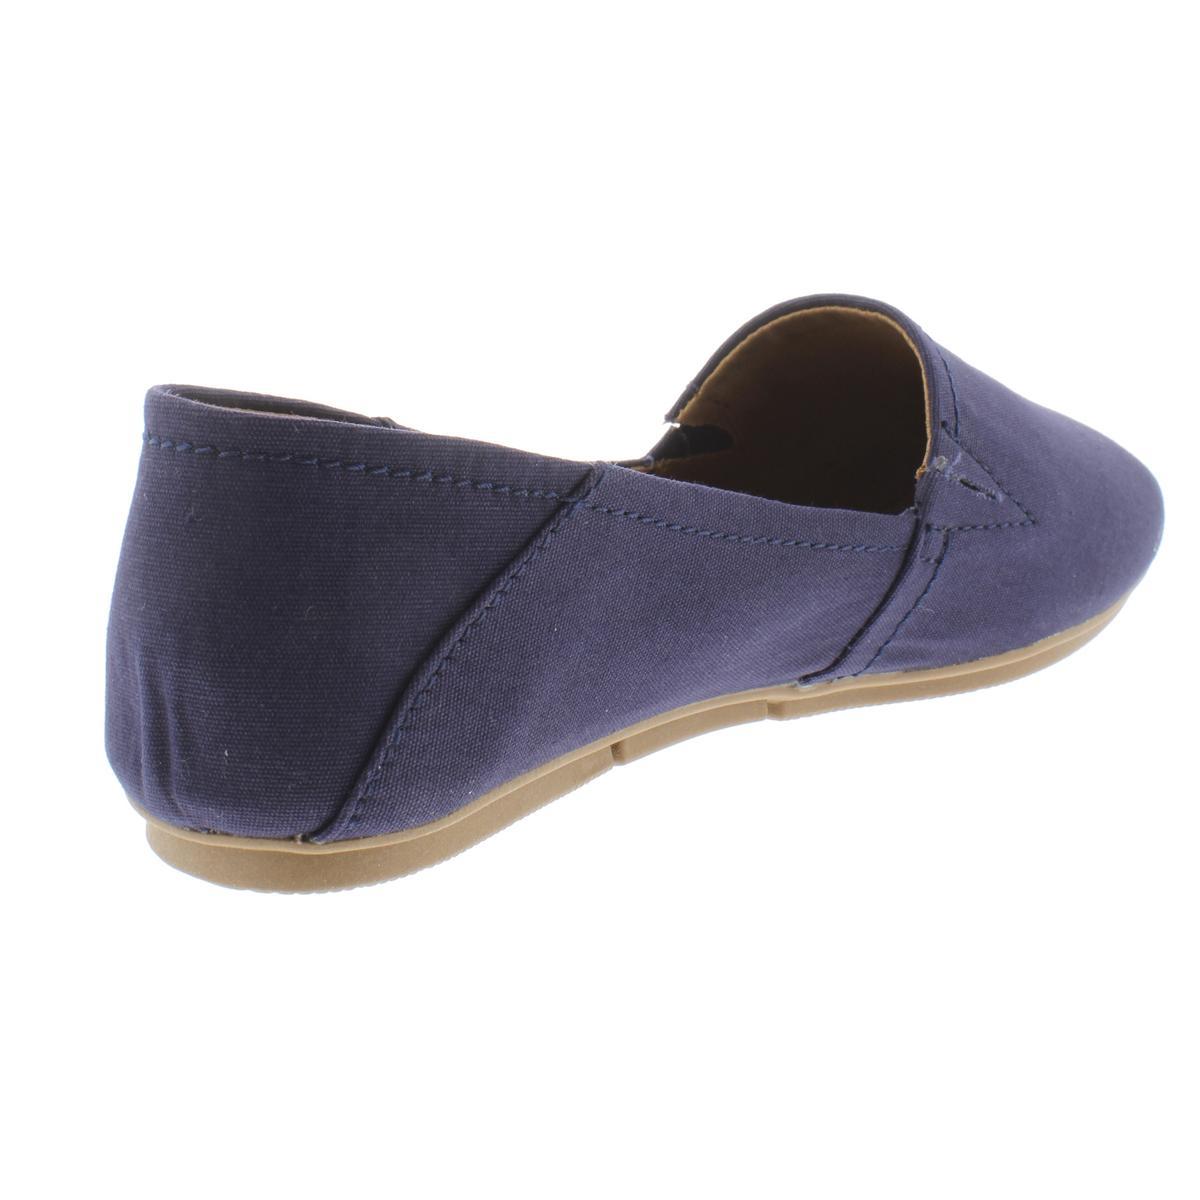 Style-amp-Co-Womens-Nixine-Slip-On-Flats-Casual-Shoes-Shoes-BHFO-6071 thumbnail 6